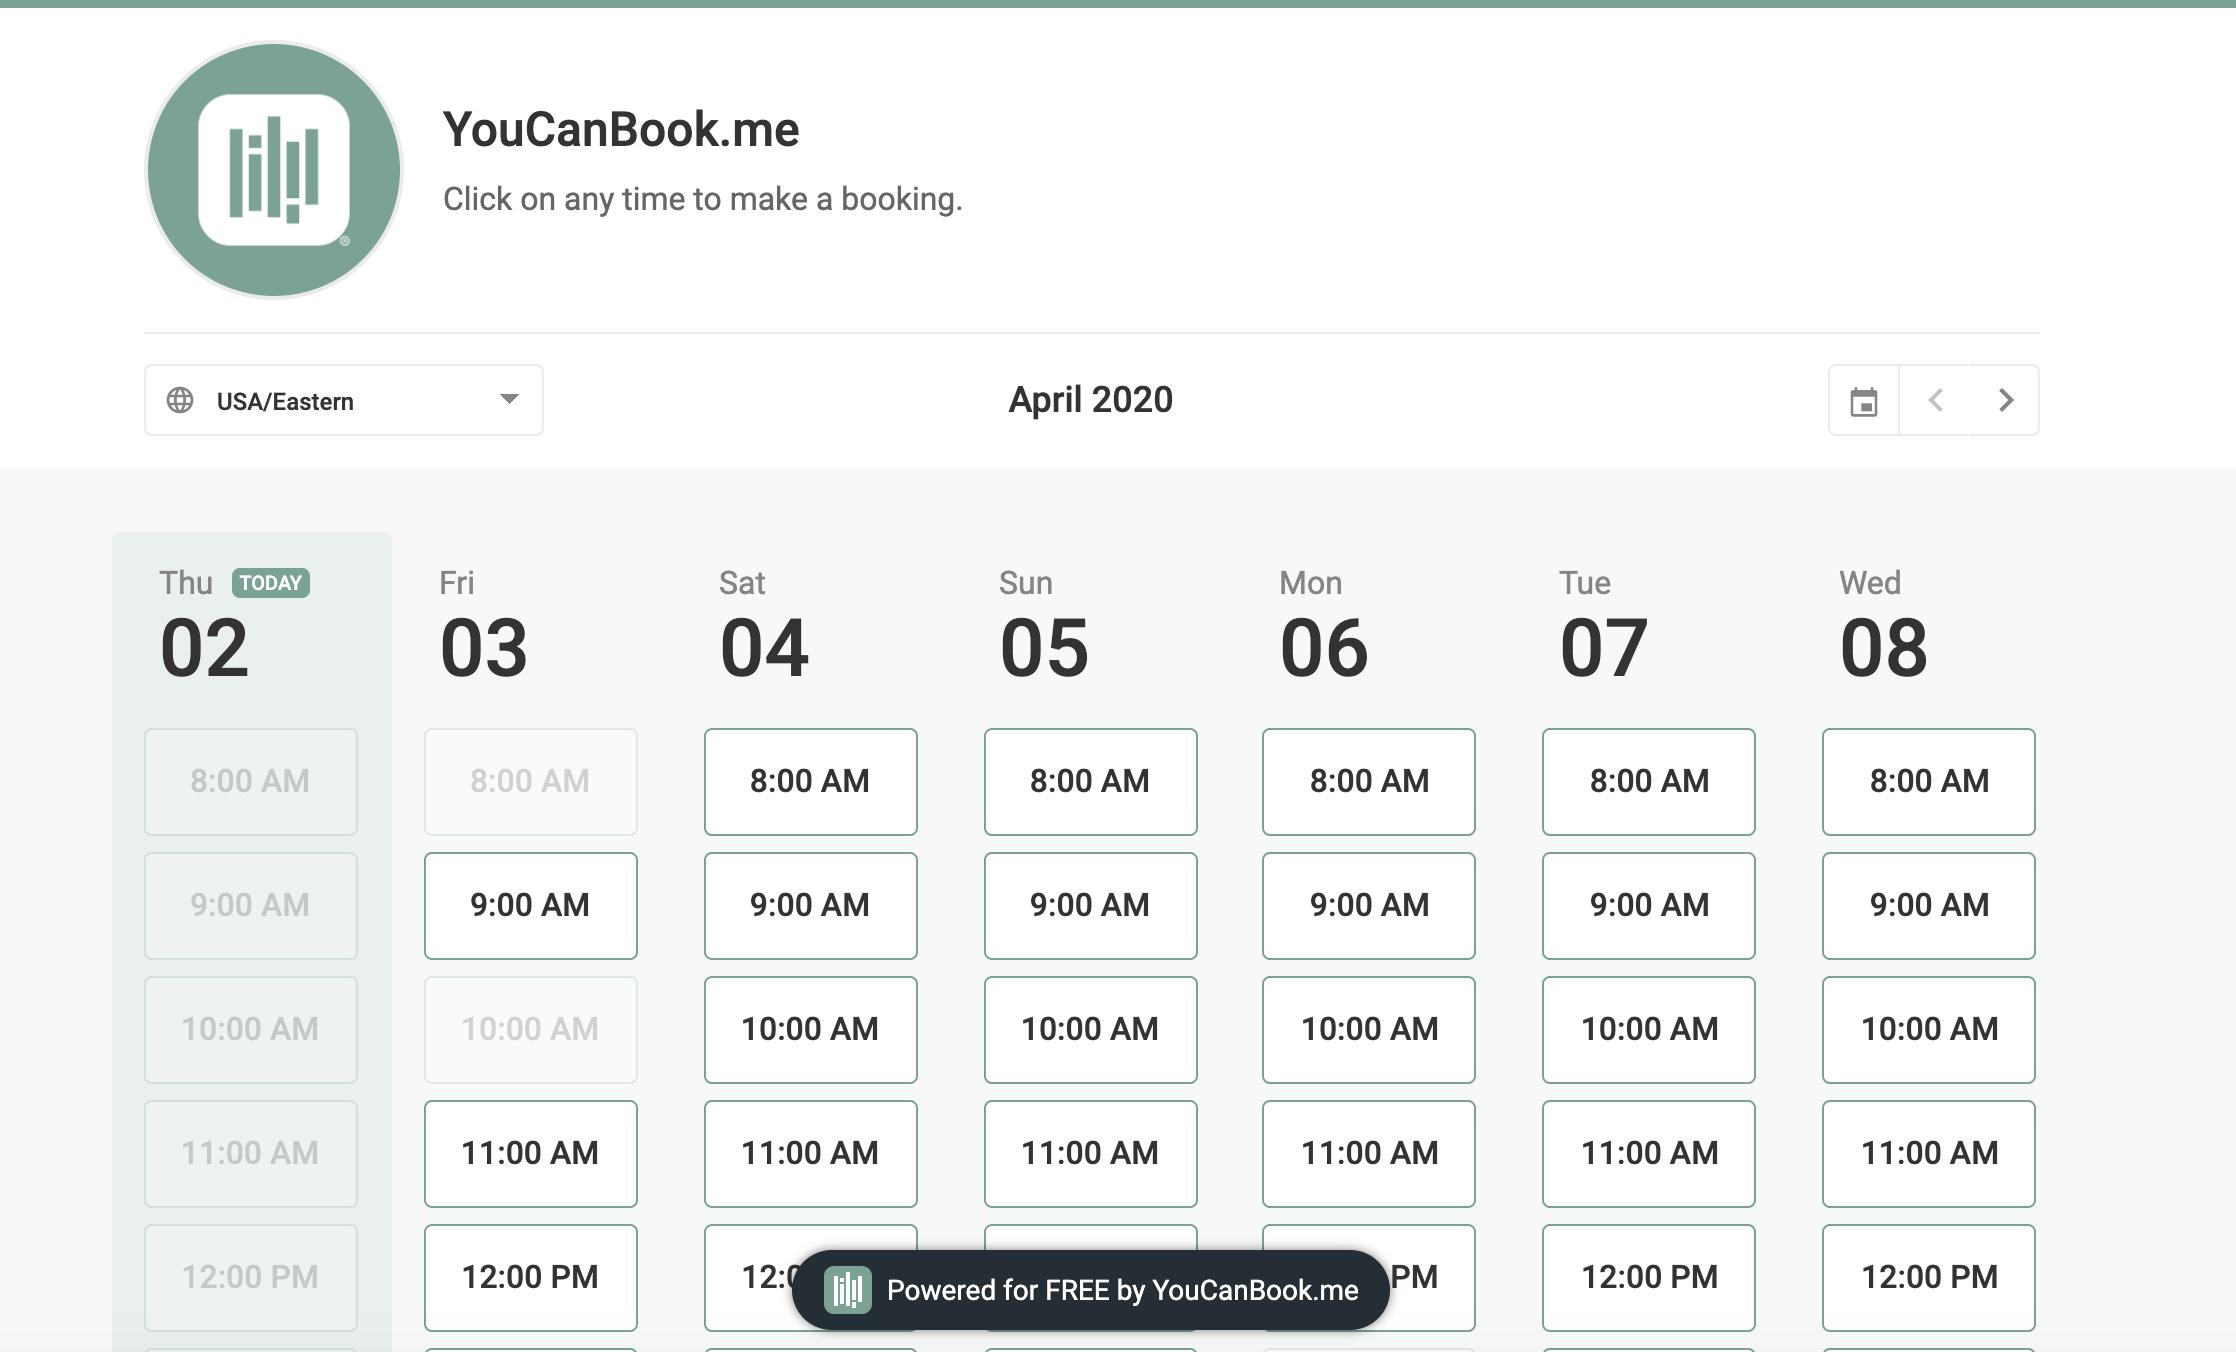 YouCanBook.me booking calendar